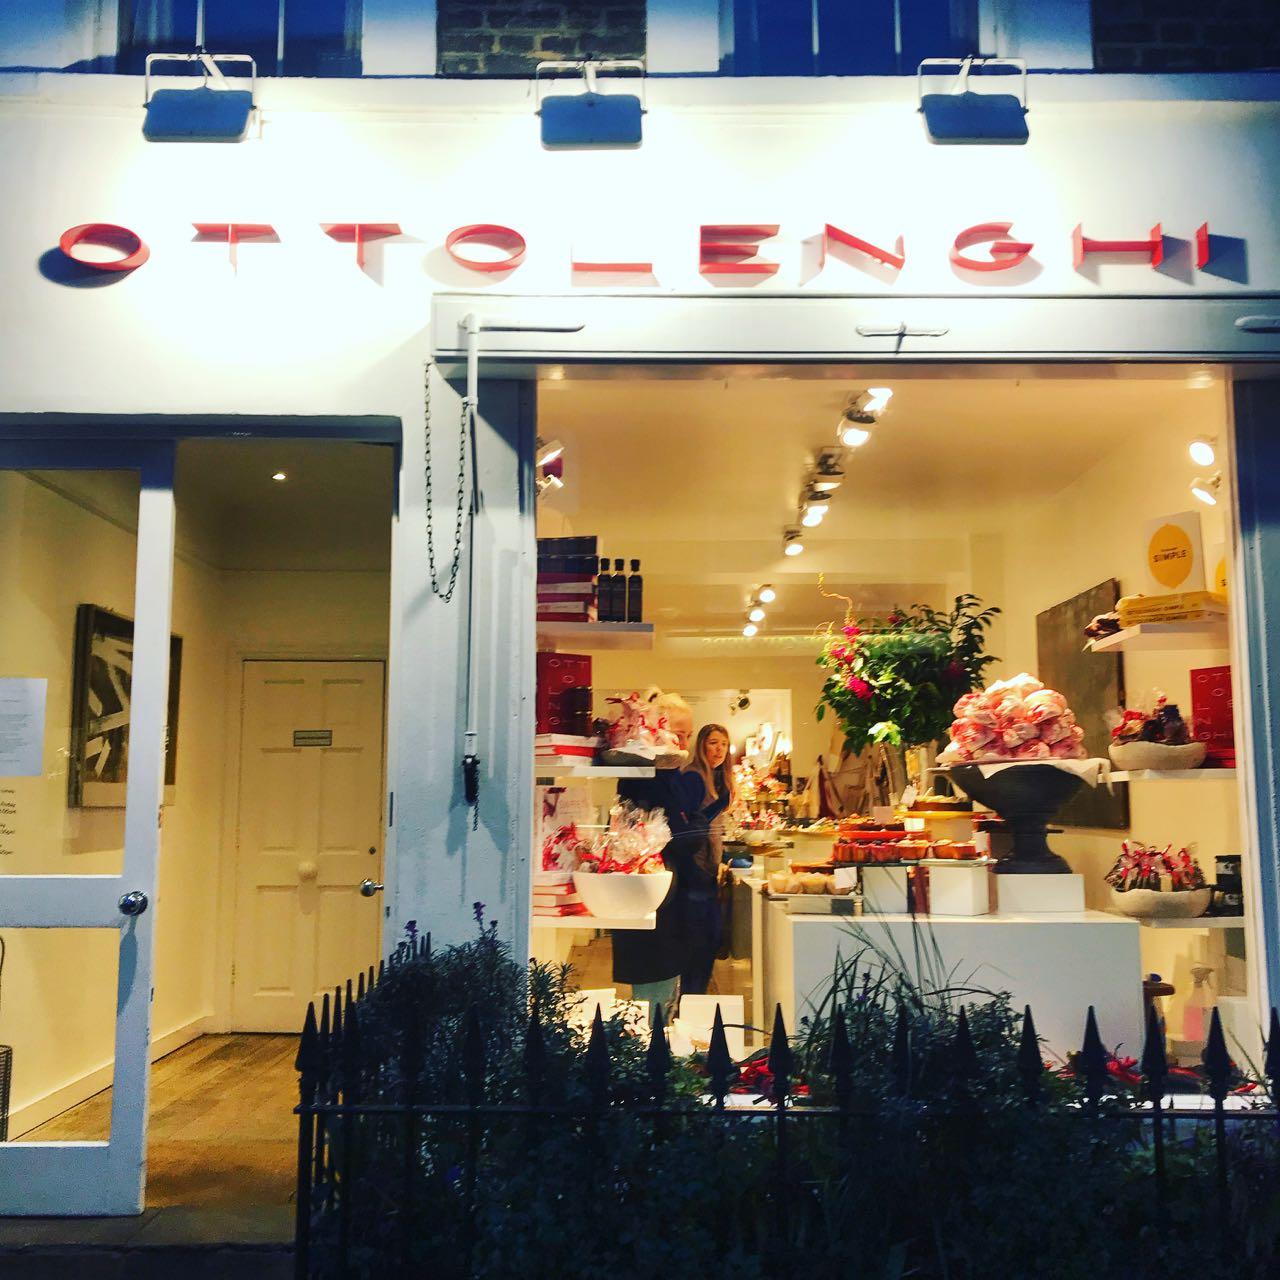 Ottolenghi